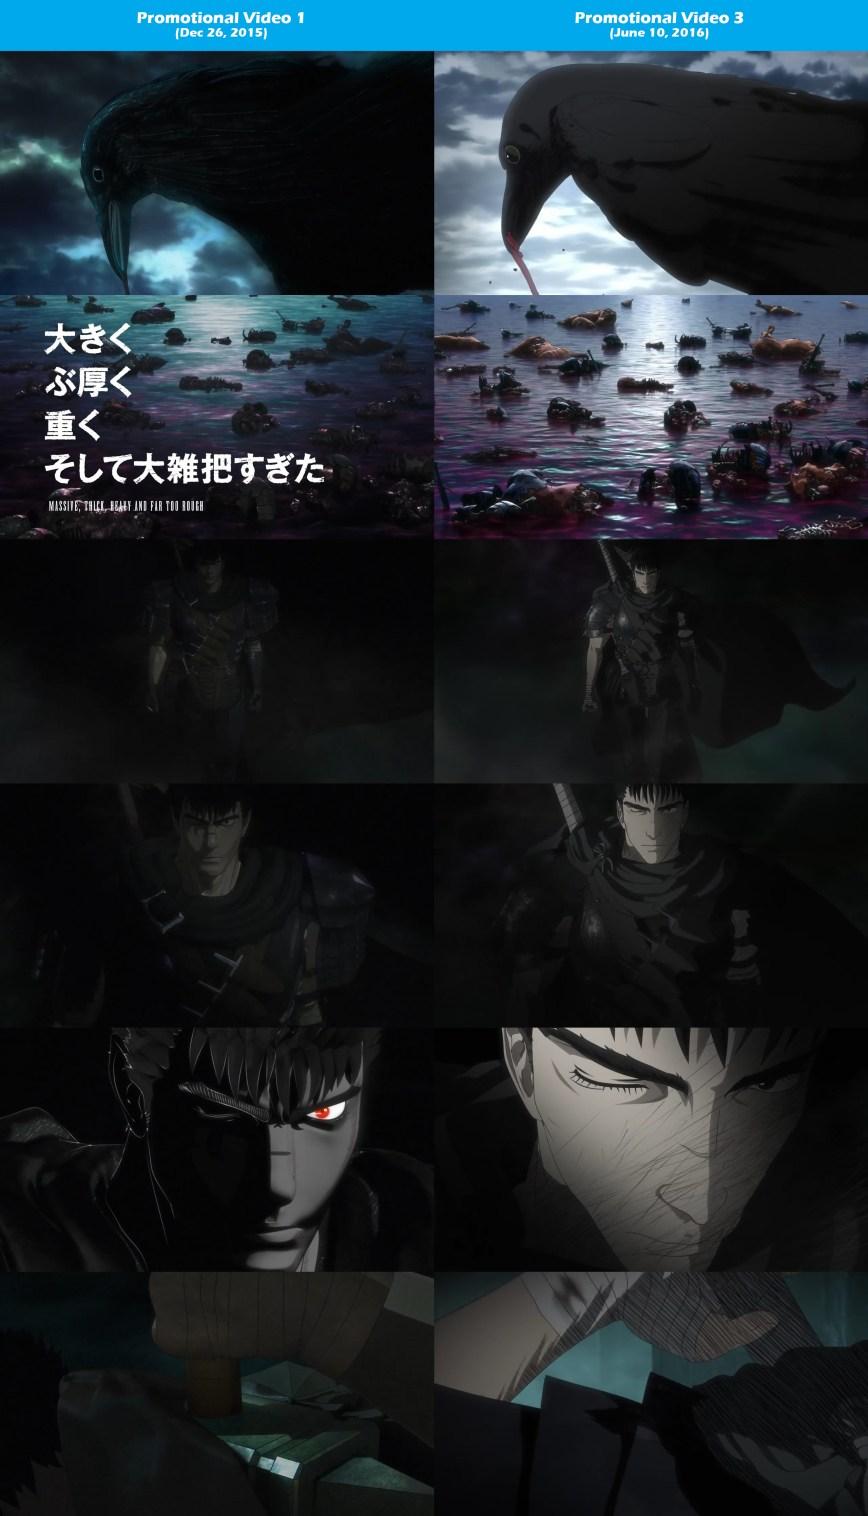 2016-Berserk-Anime-PV-1-vs-PV-3-Comparison-1